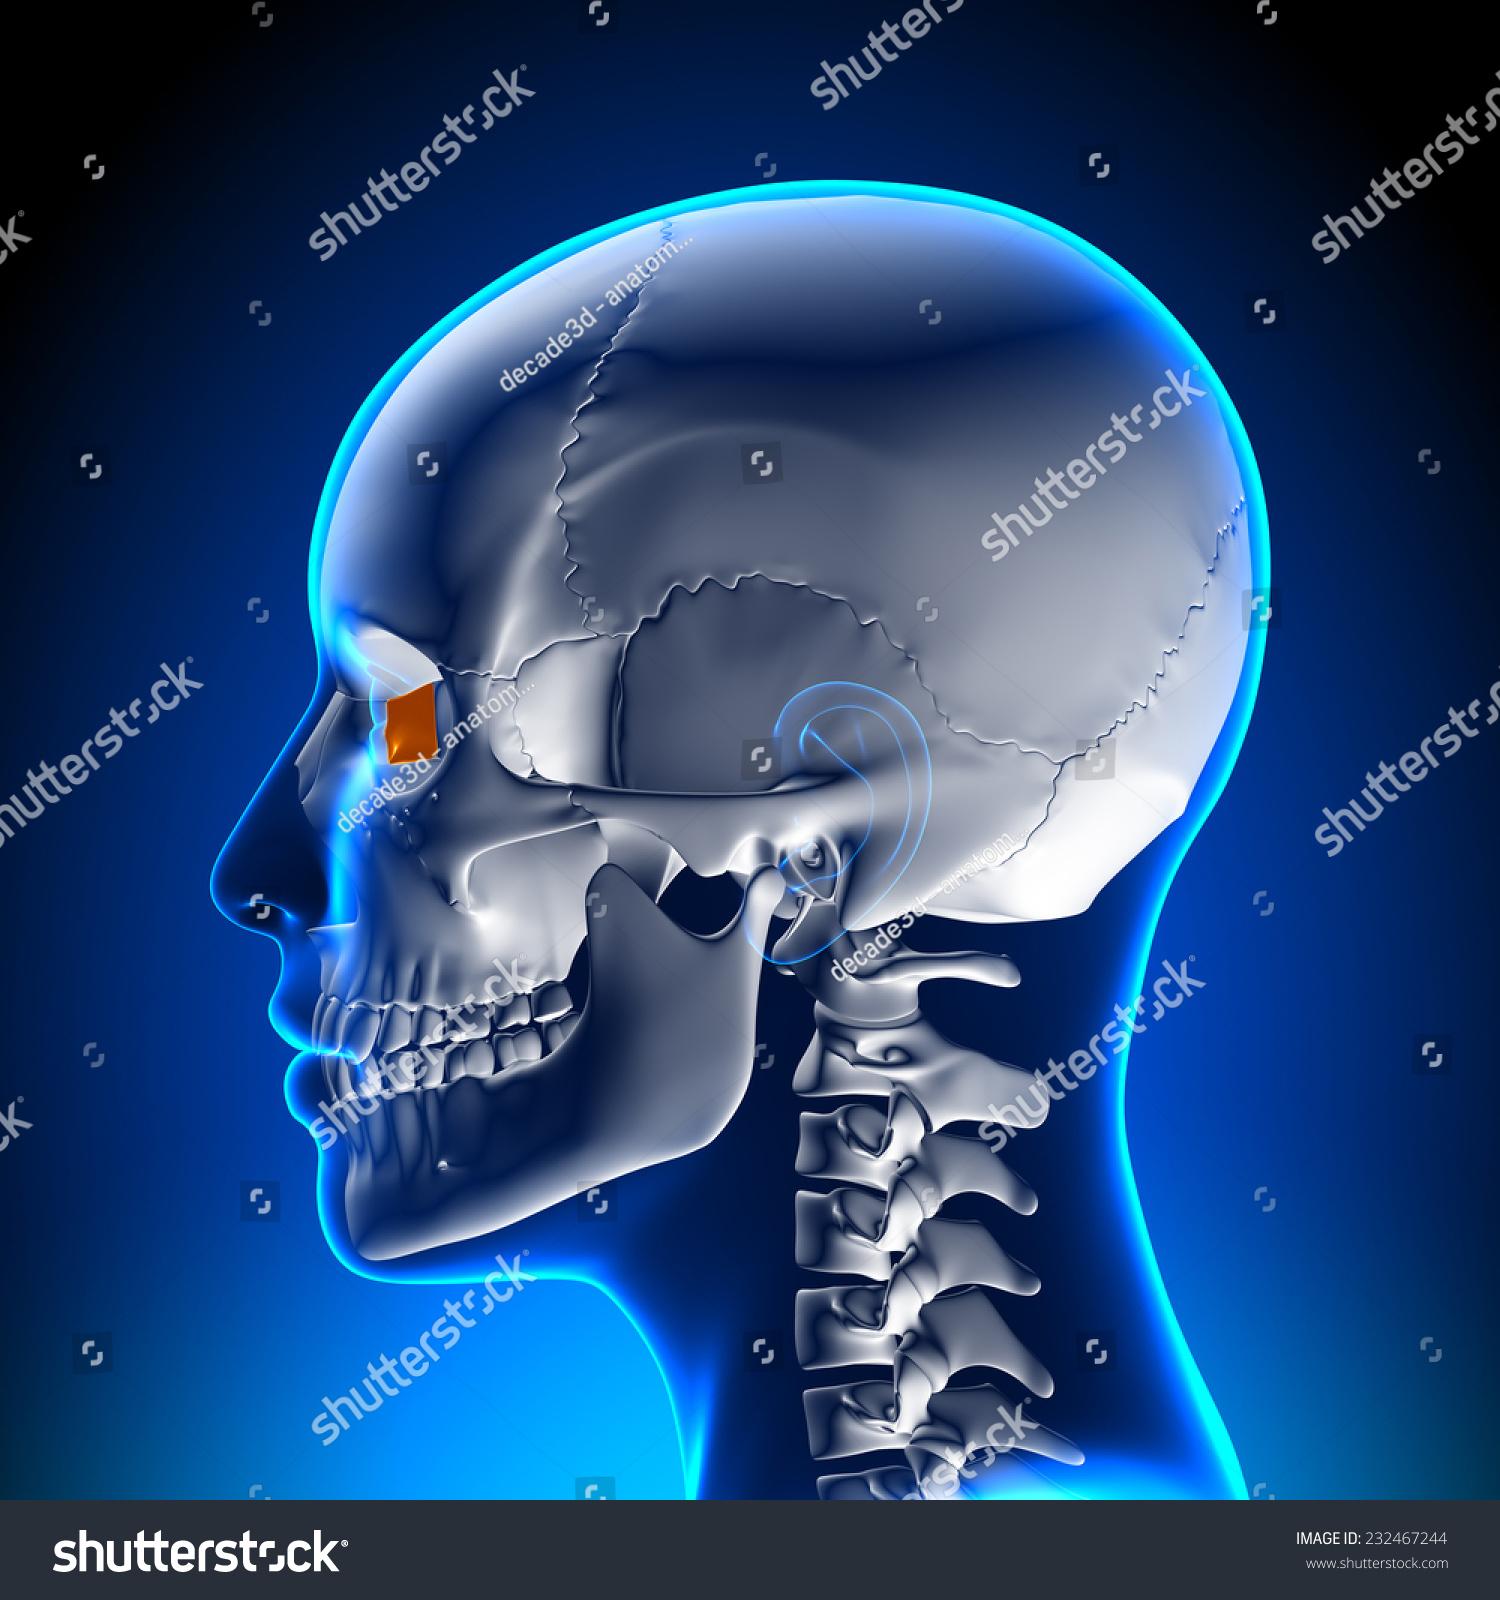 Female Lacrimal Bone Skull Anatomy Stock Illustration 232467244 ...